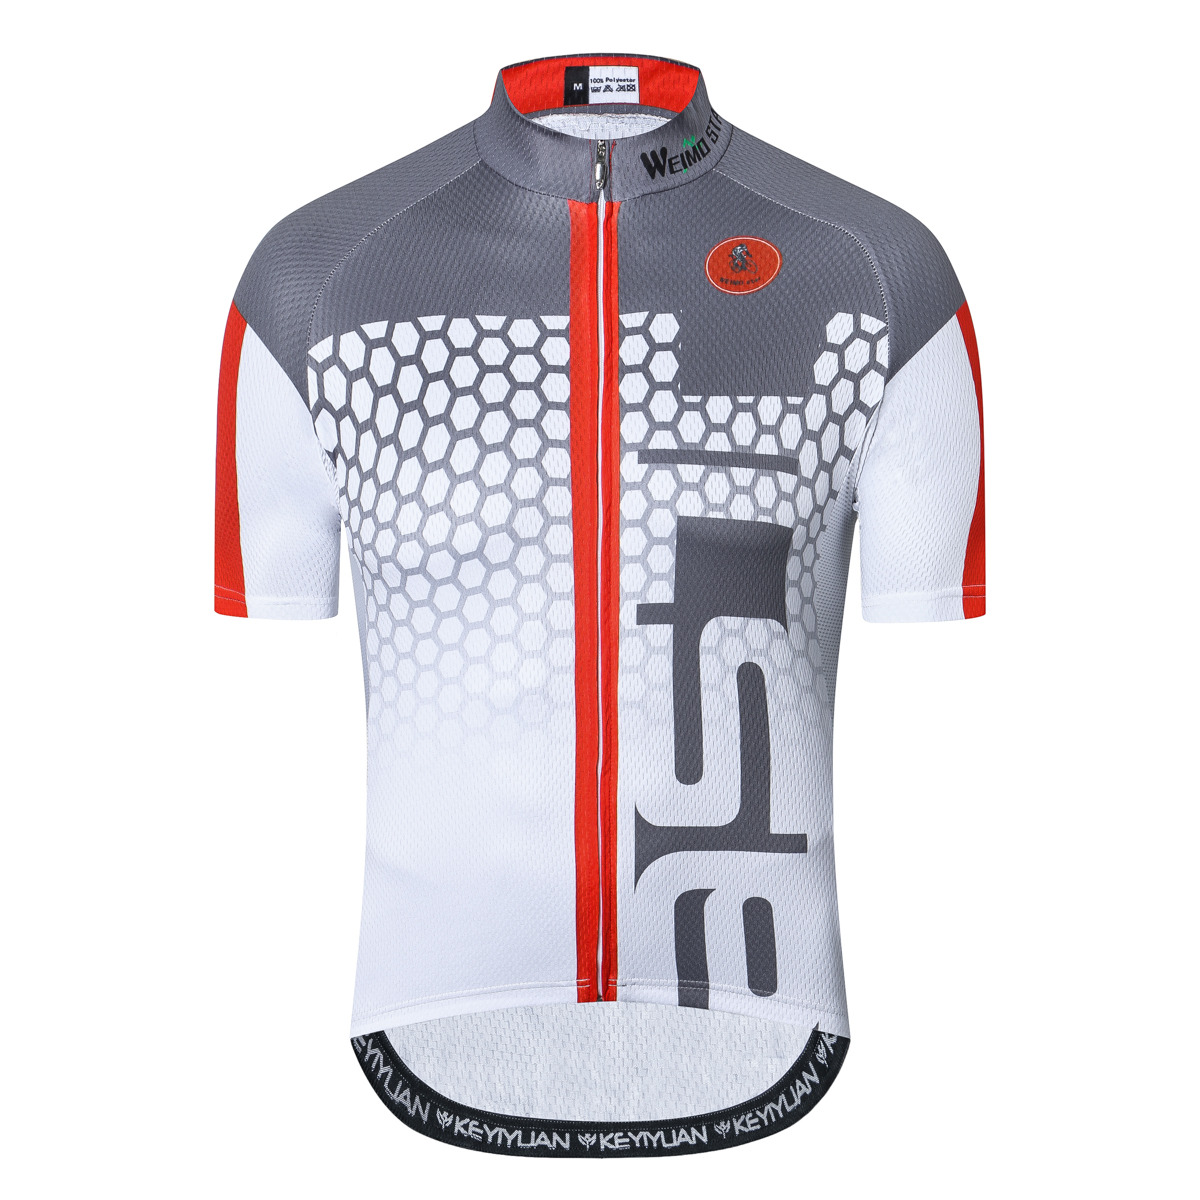 Men/'s Cycling Jersey Bicycle Short Sleeve Shirt Cycling Top Bike Clothing YL70